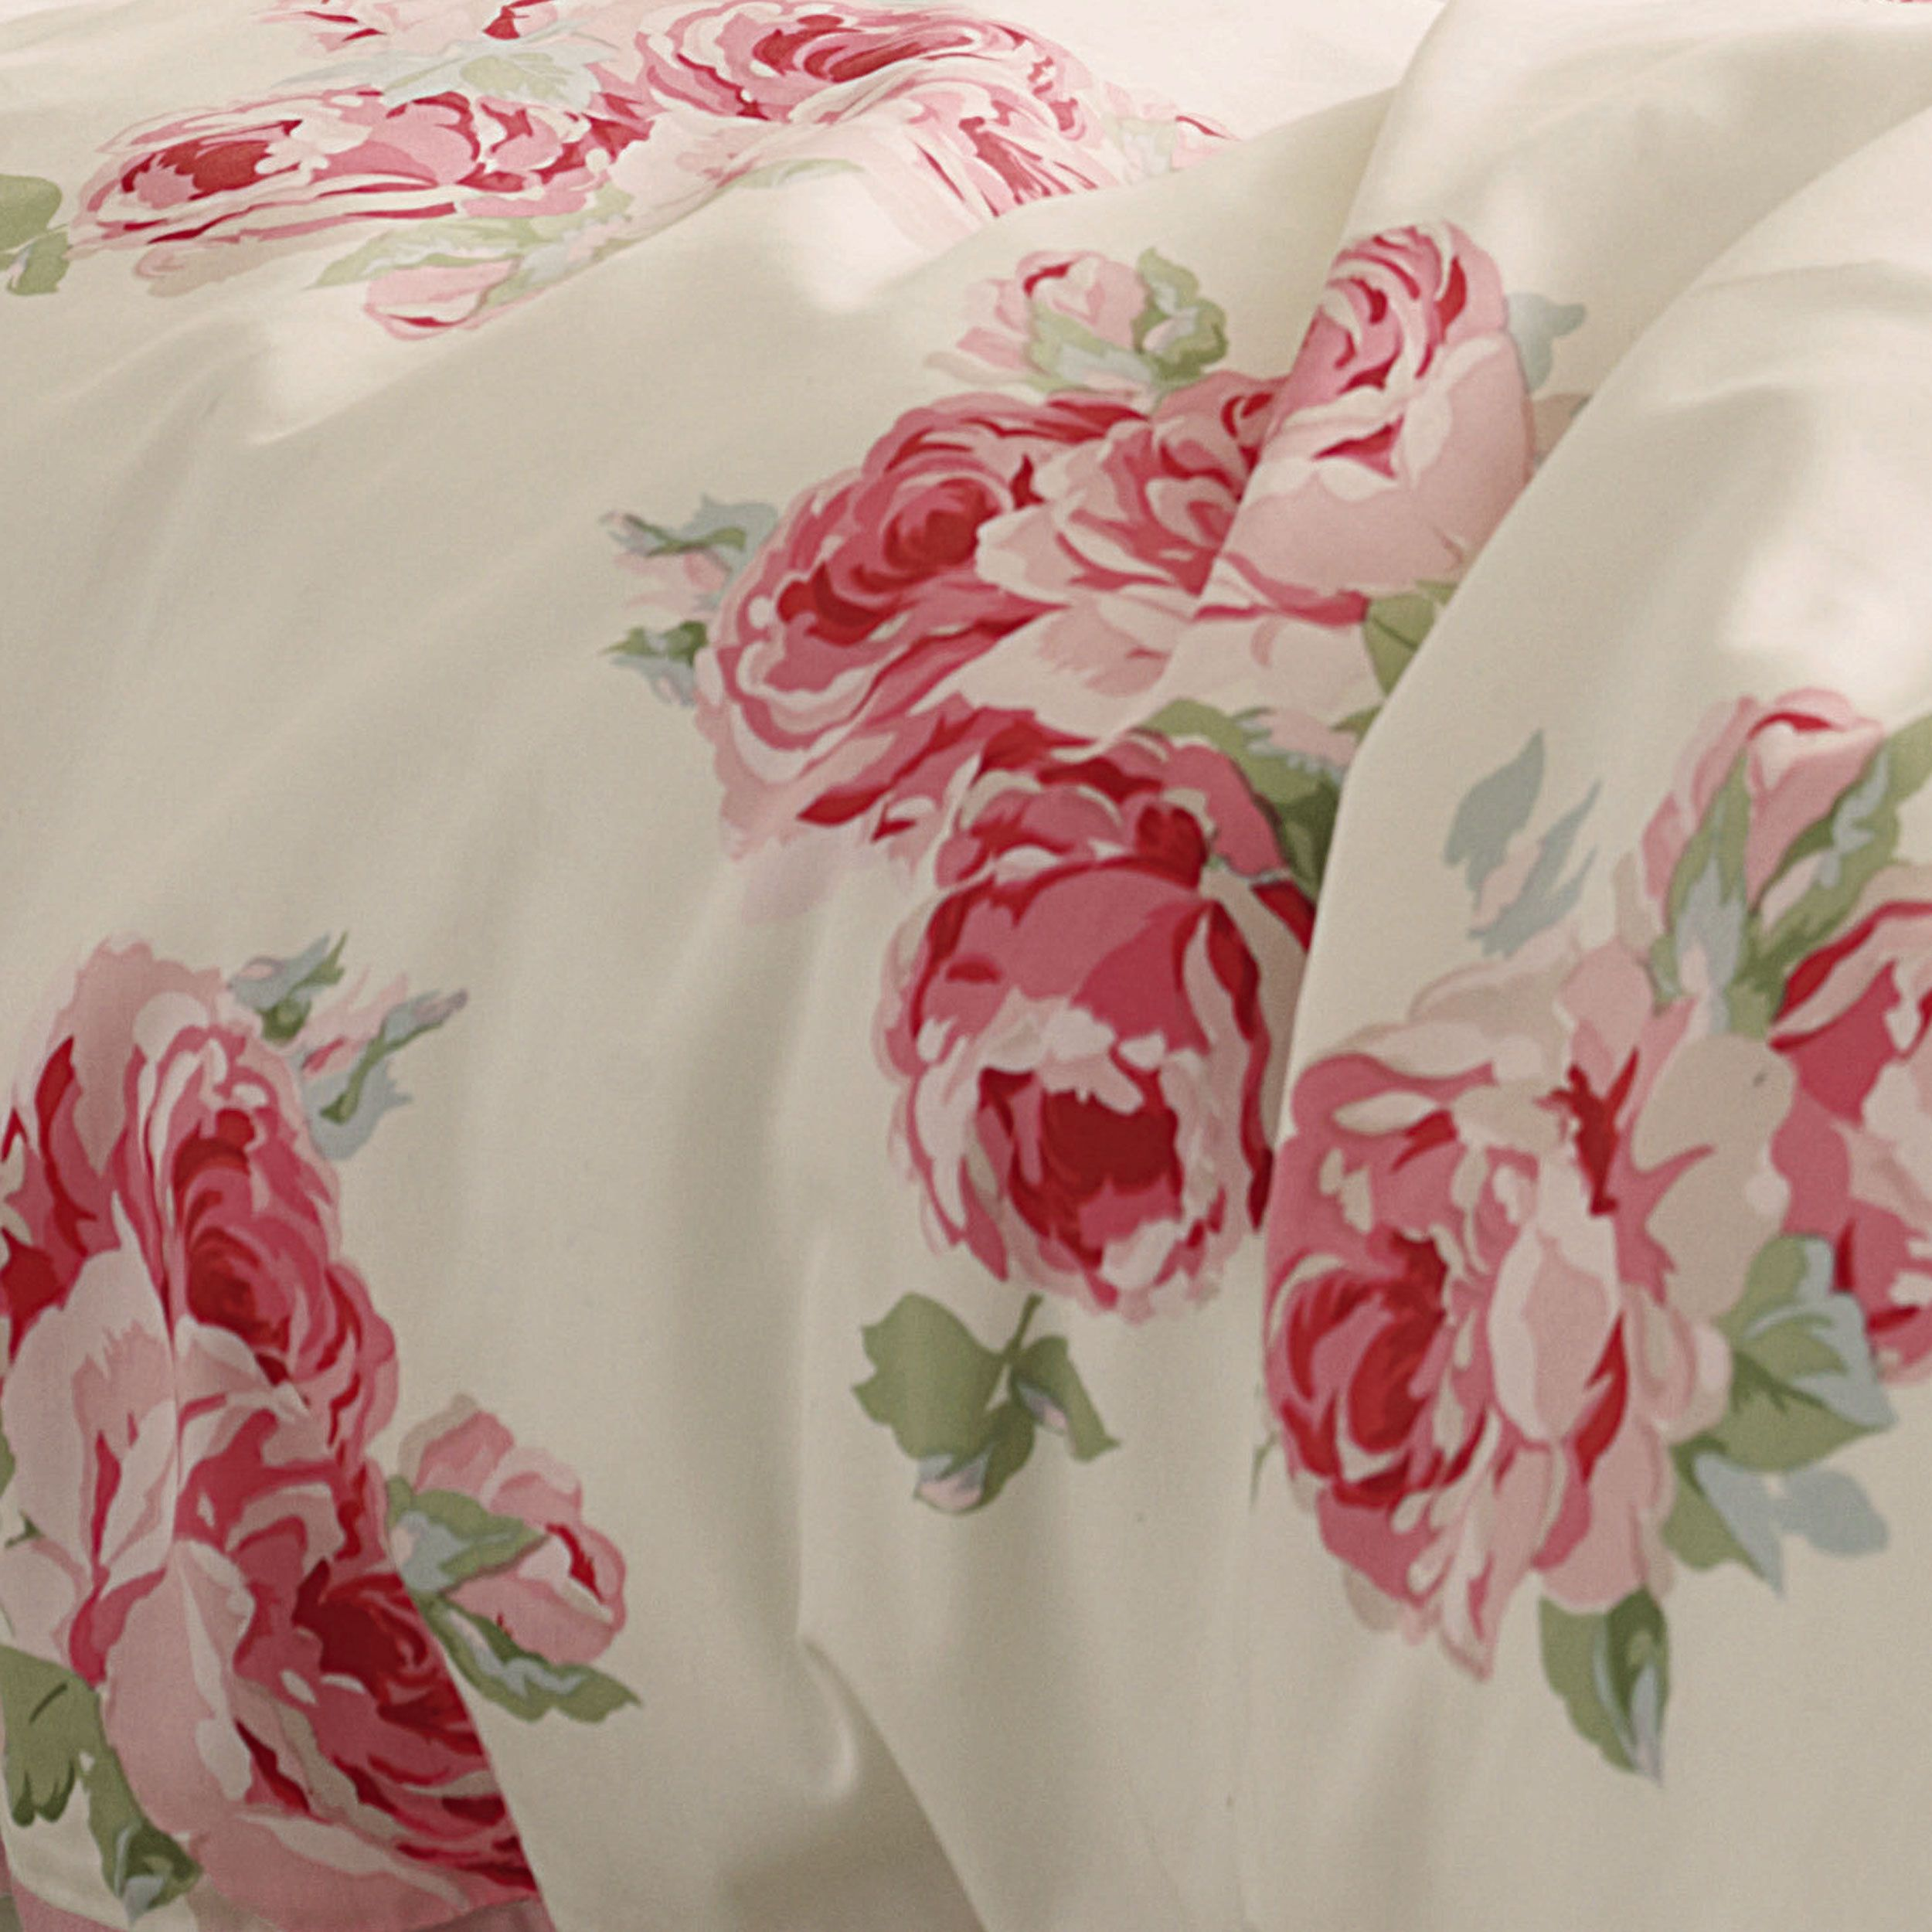 Laura Ashley Couture Rose Cotton Duvet Cover